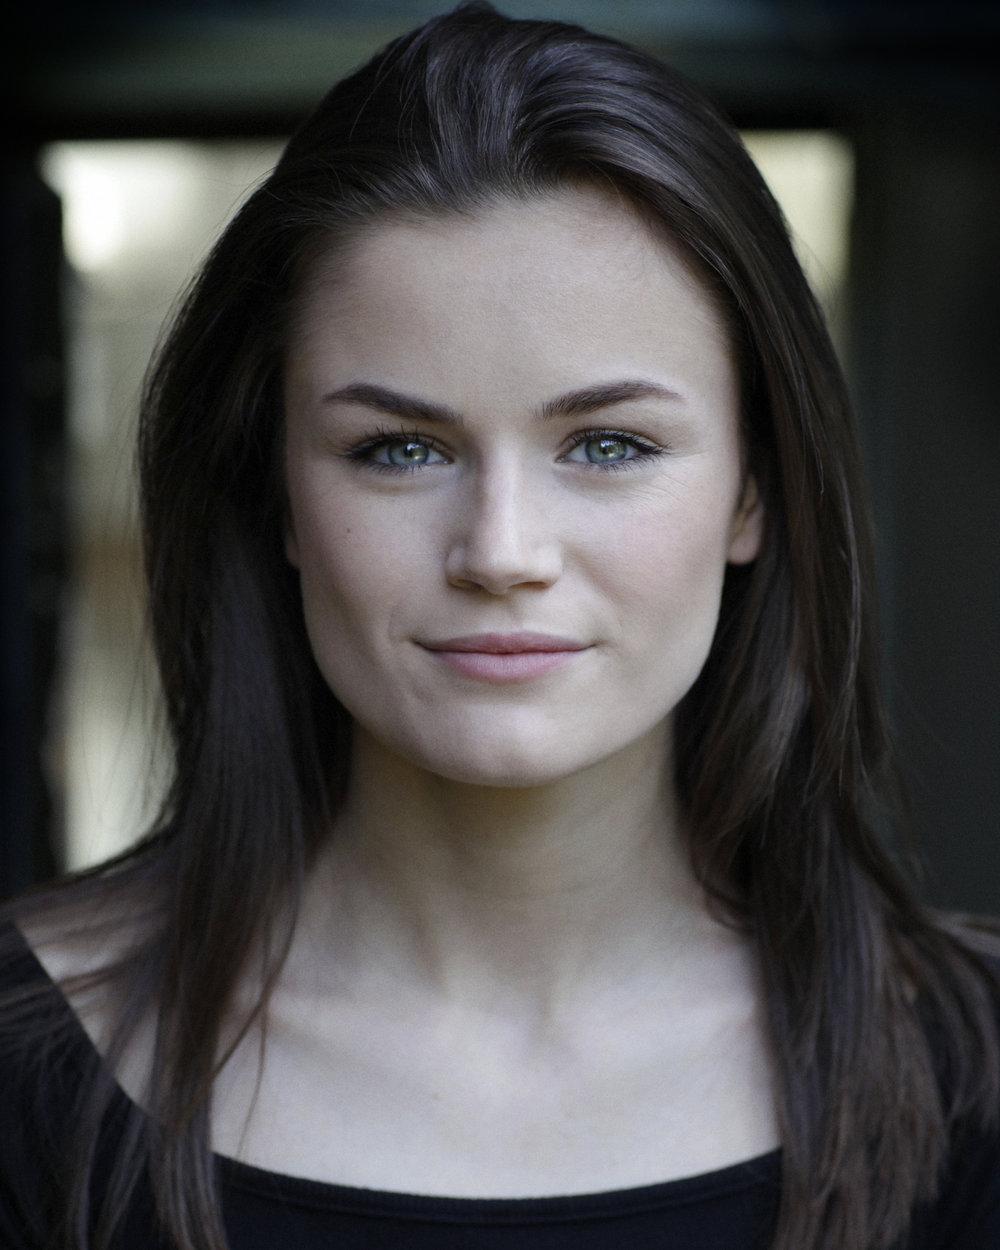 Isobel Jordan